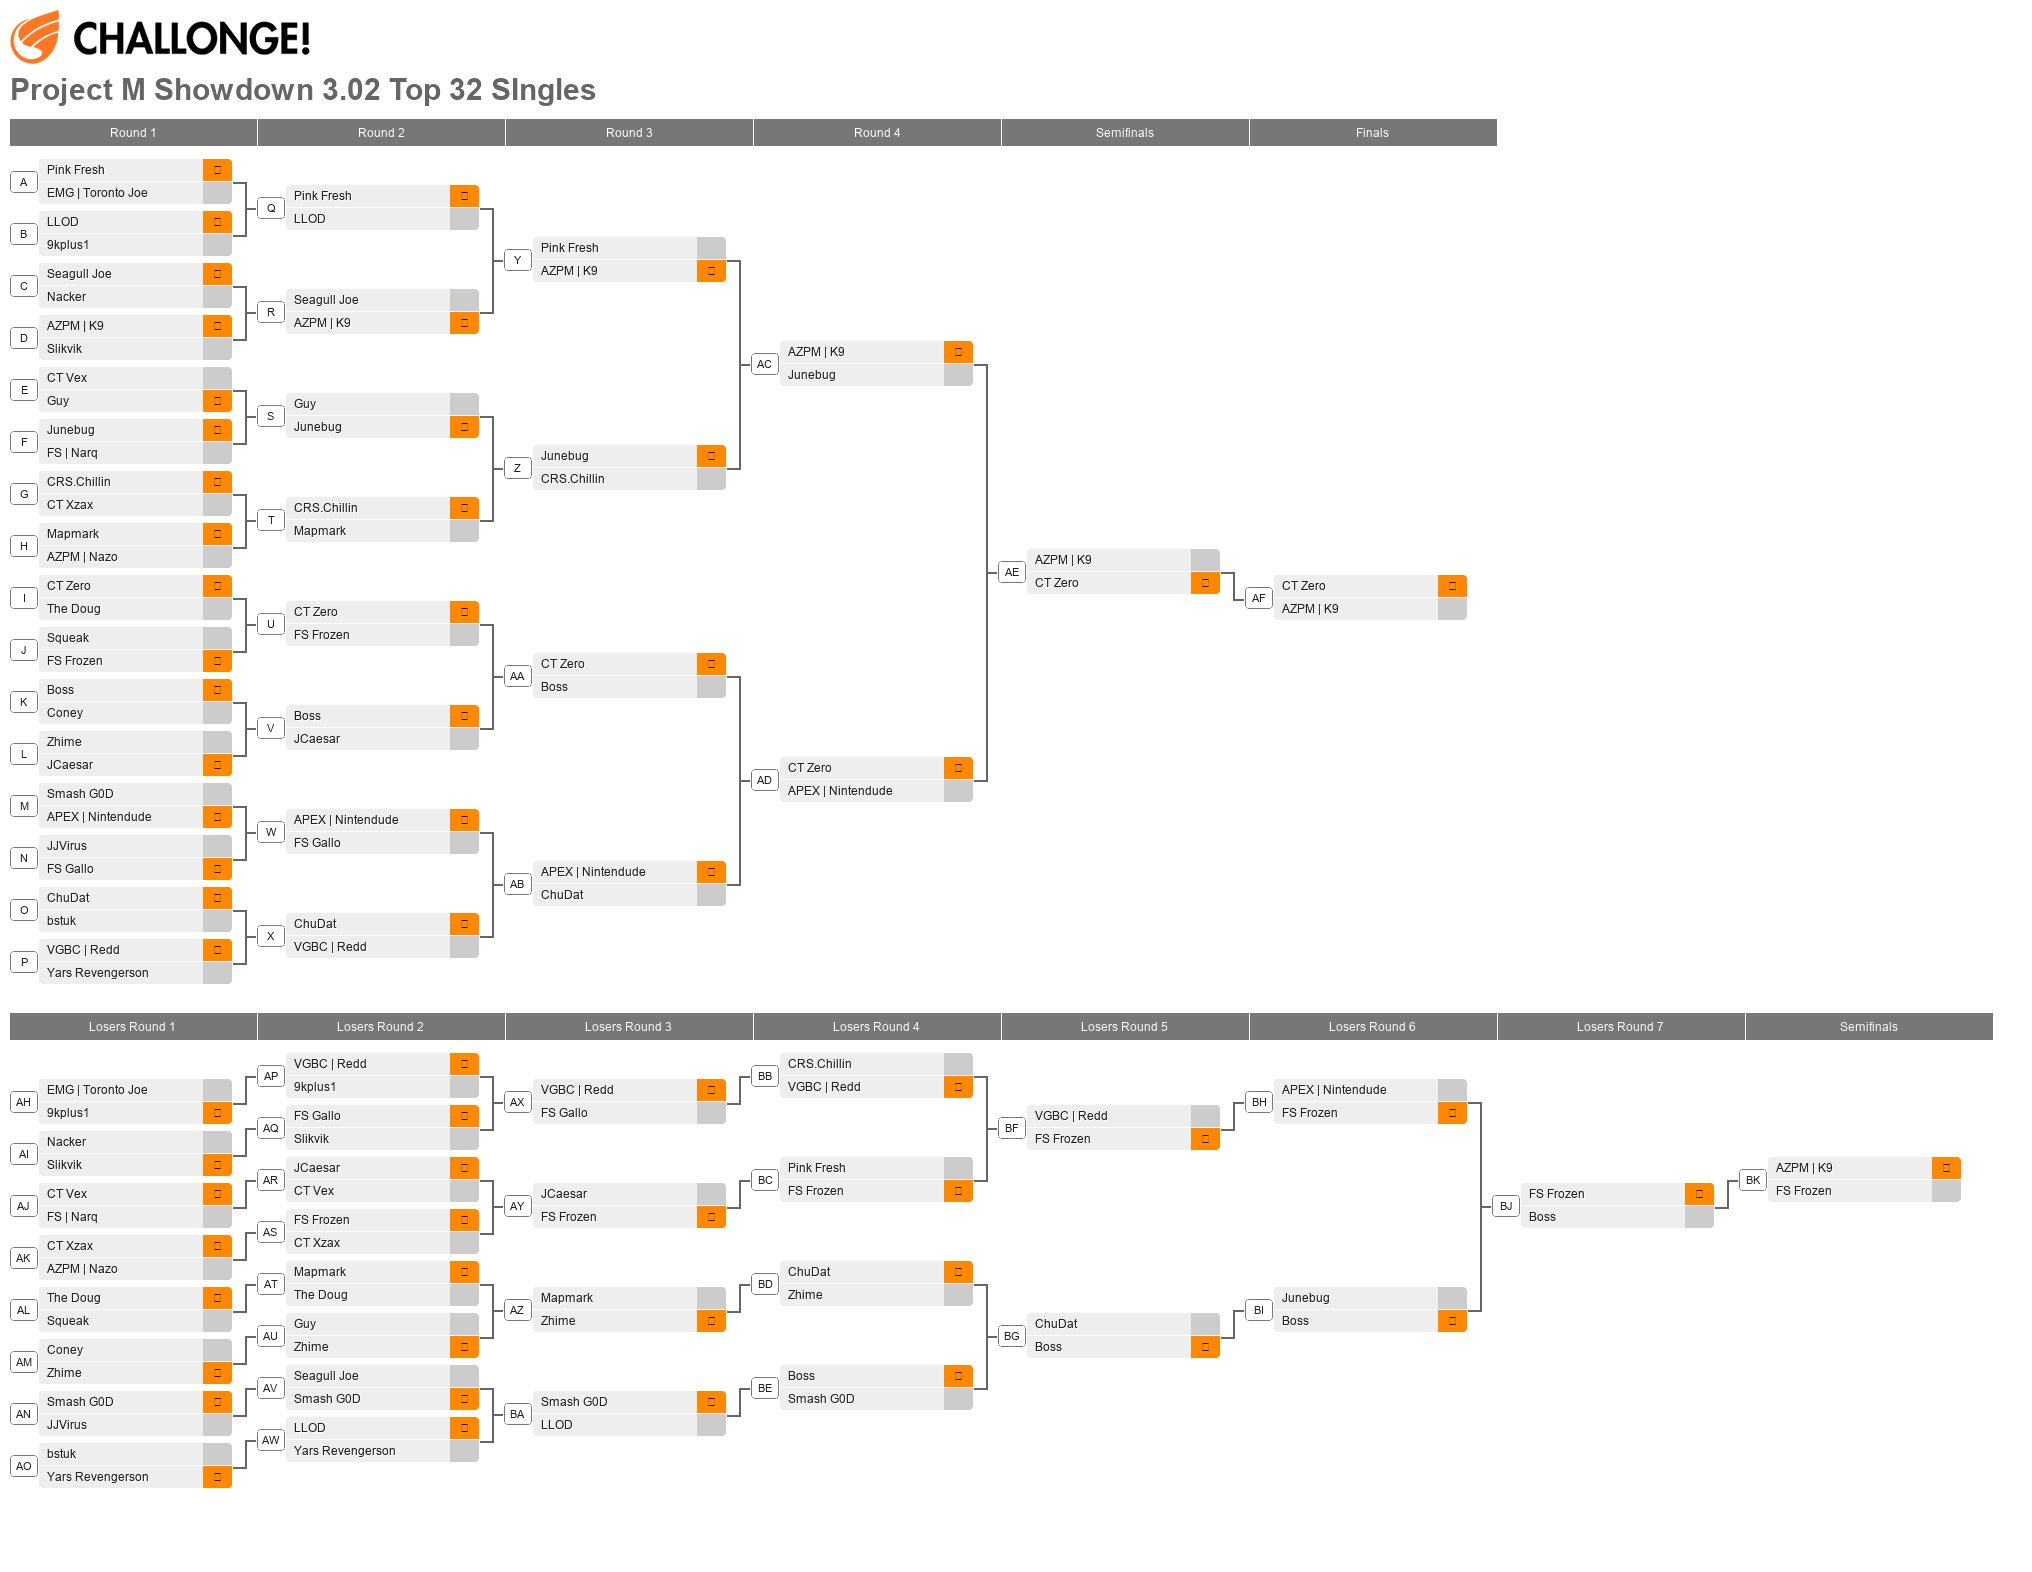 Project M Showdown 3.02 Top 32 SIngles